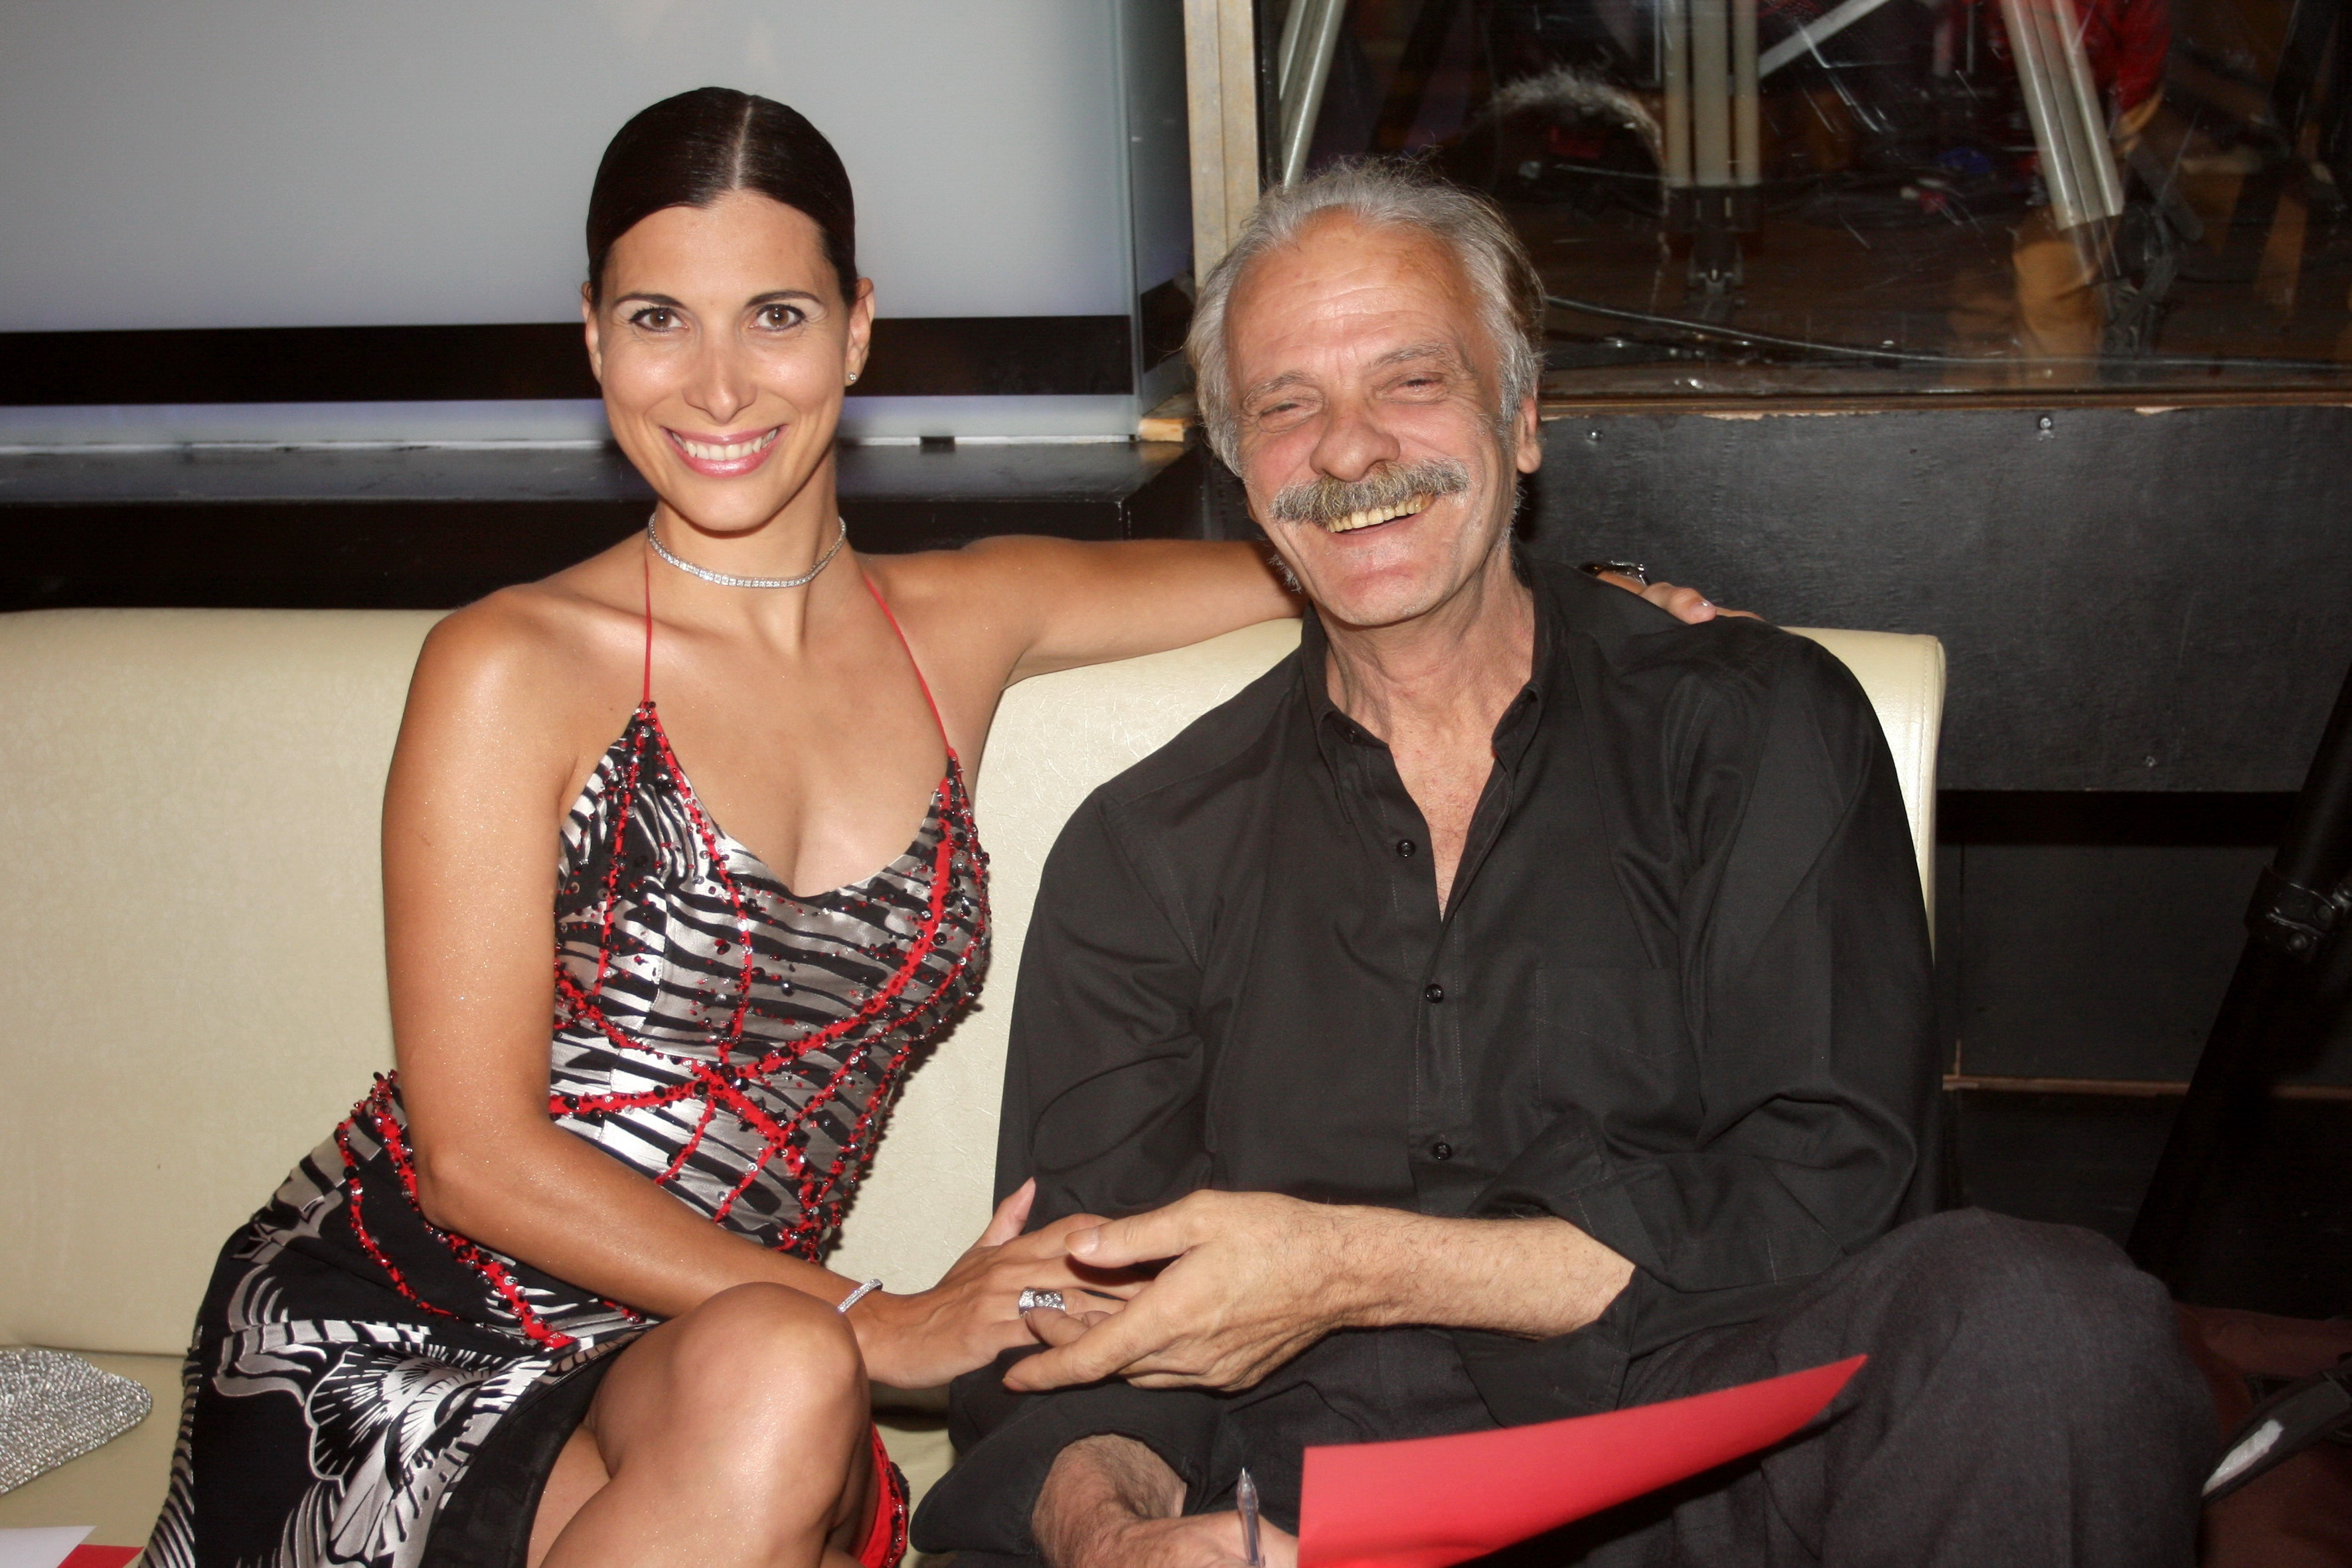 MR AND MISS INTERNATIONAL BEAUTY 2009